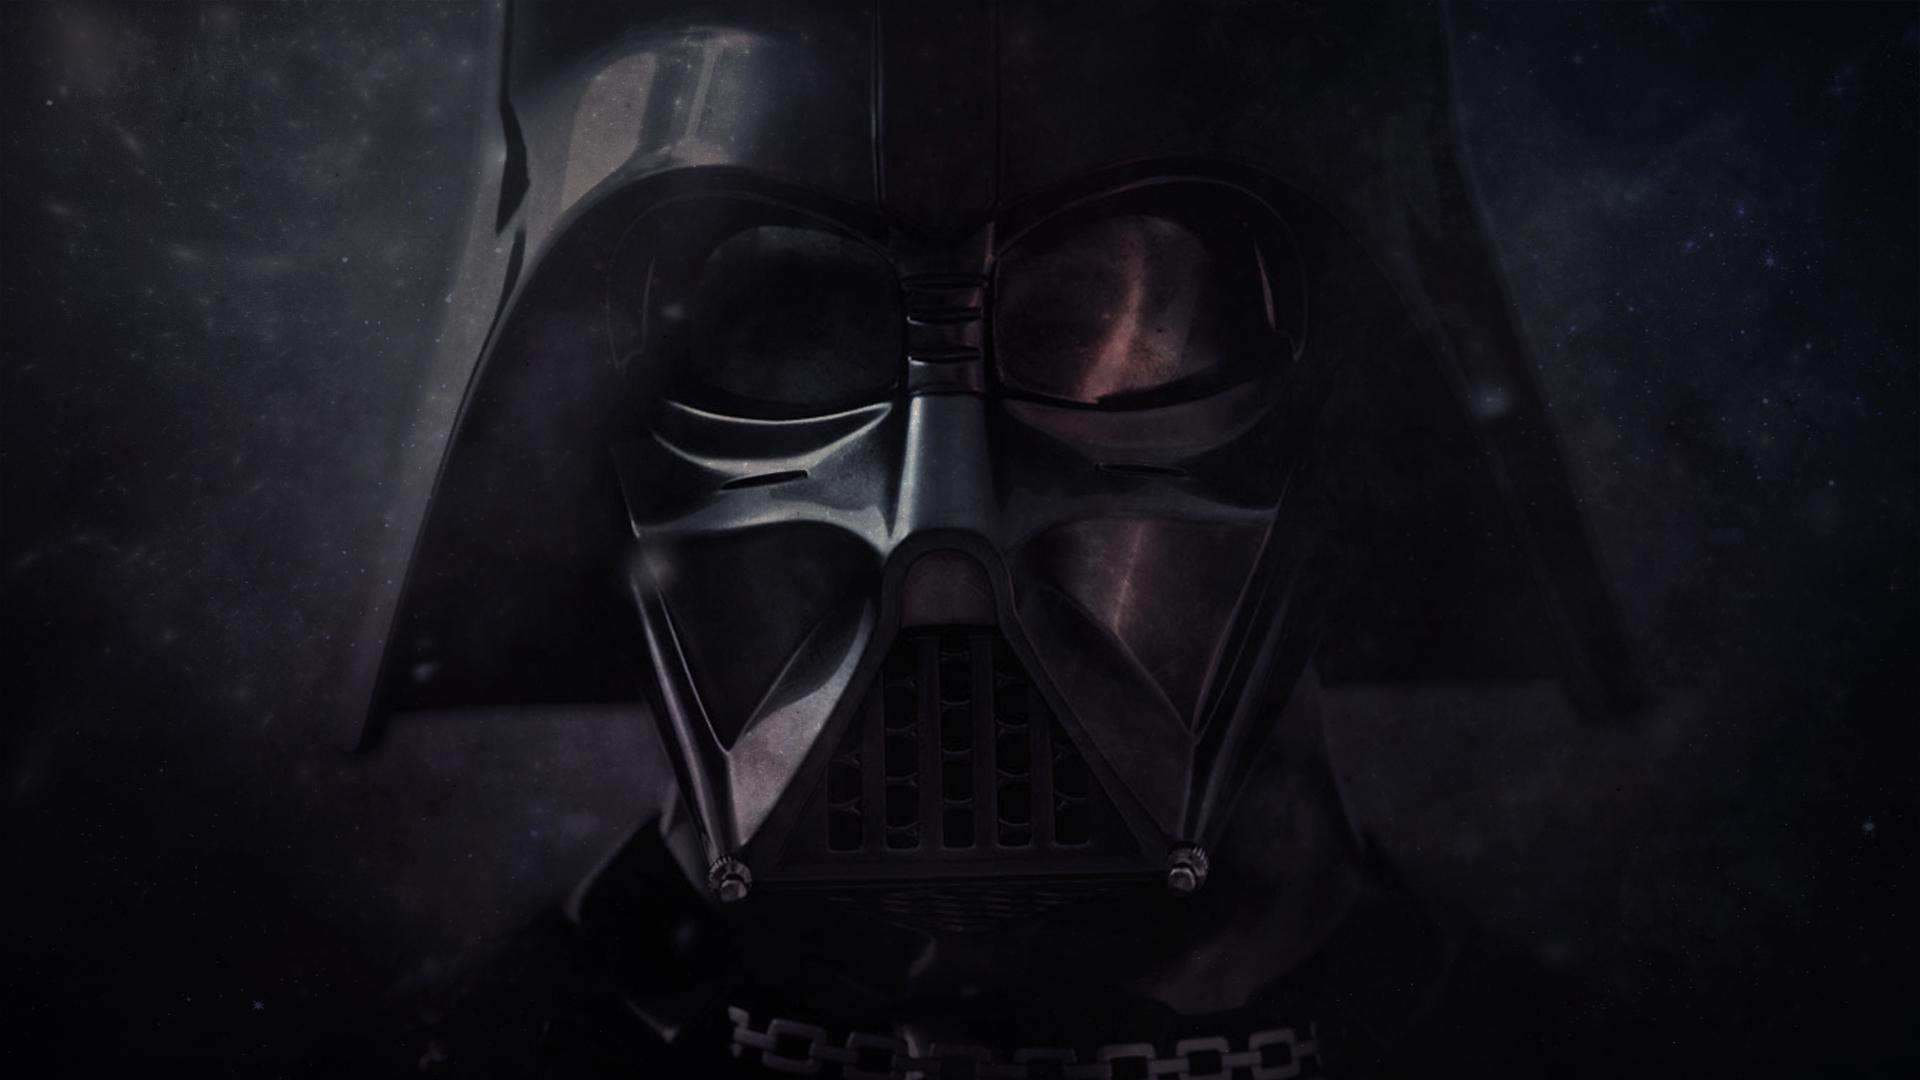 Wallpaper 1080p Darth Vader by iamsointense on deviantART 1920x1080